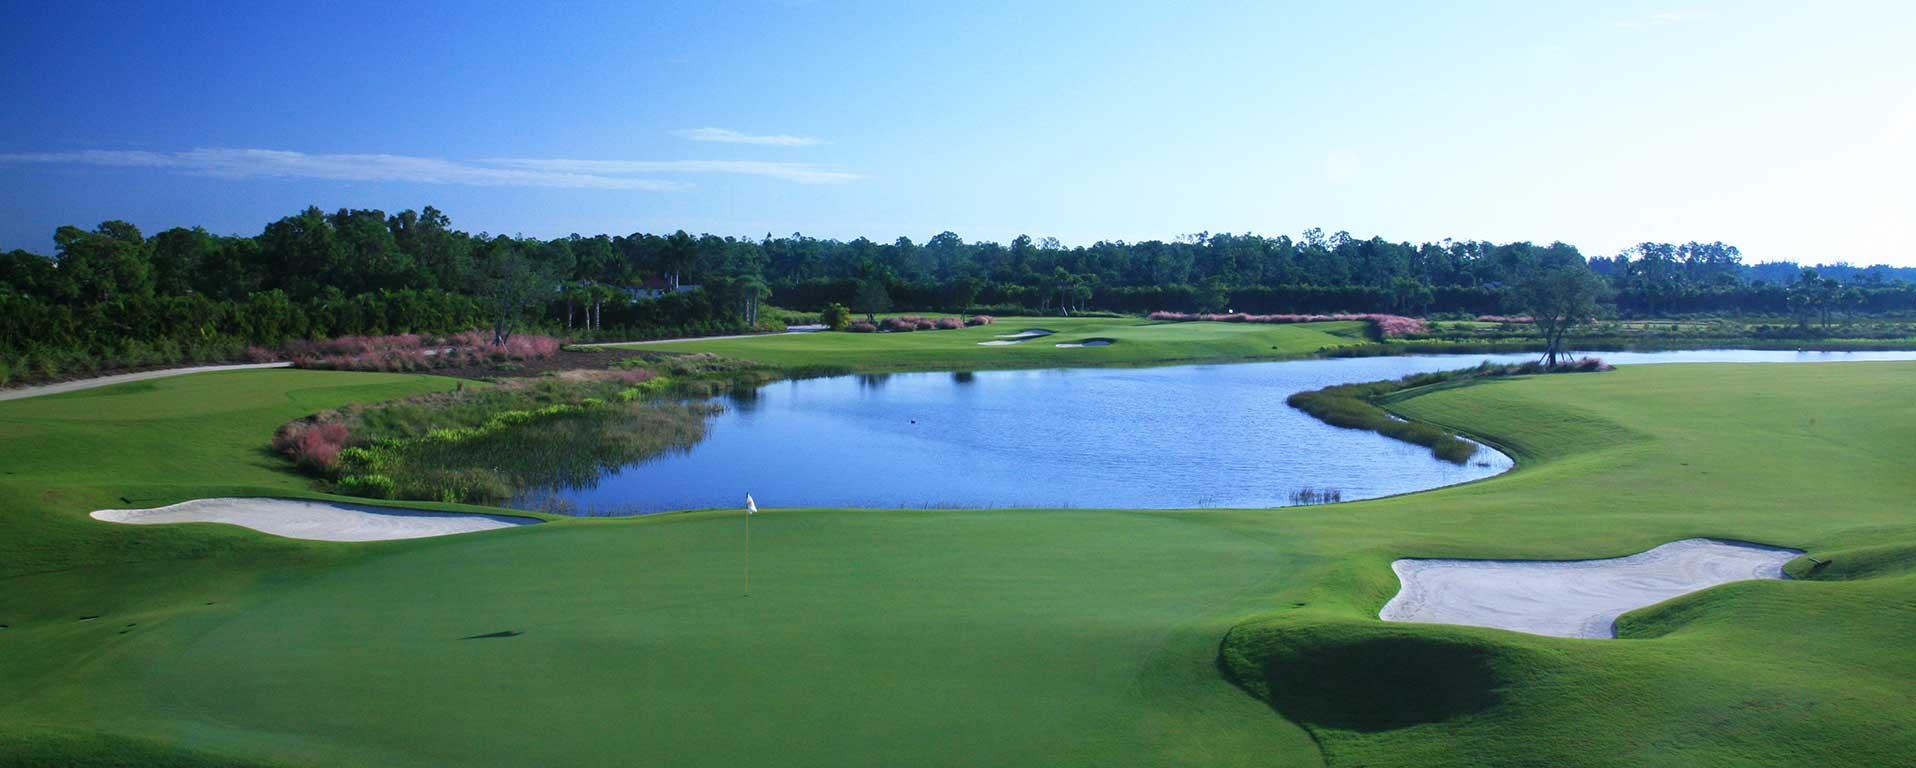 Peninsula Treviso Bay, Golf Course, Treviso Bay, Peninsula, TPC Golf, Naples, Florida, Paradise Coast, Peninsula Treviso Bay,